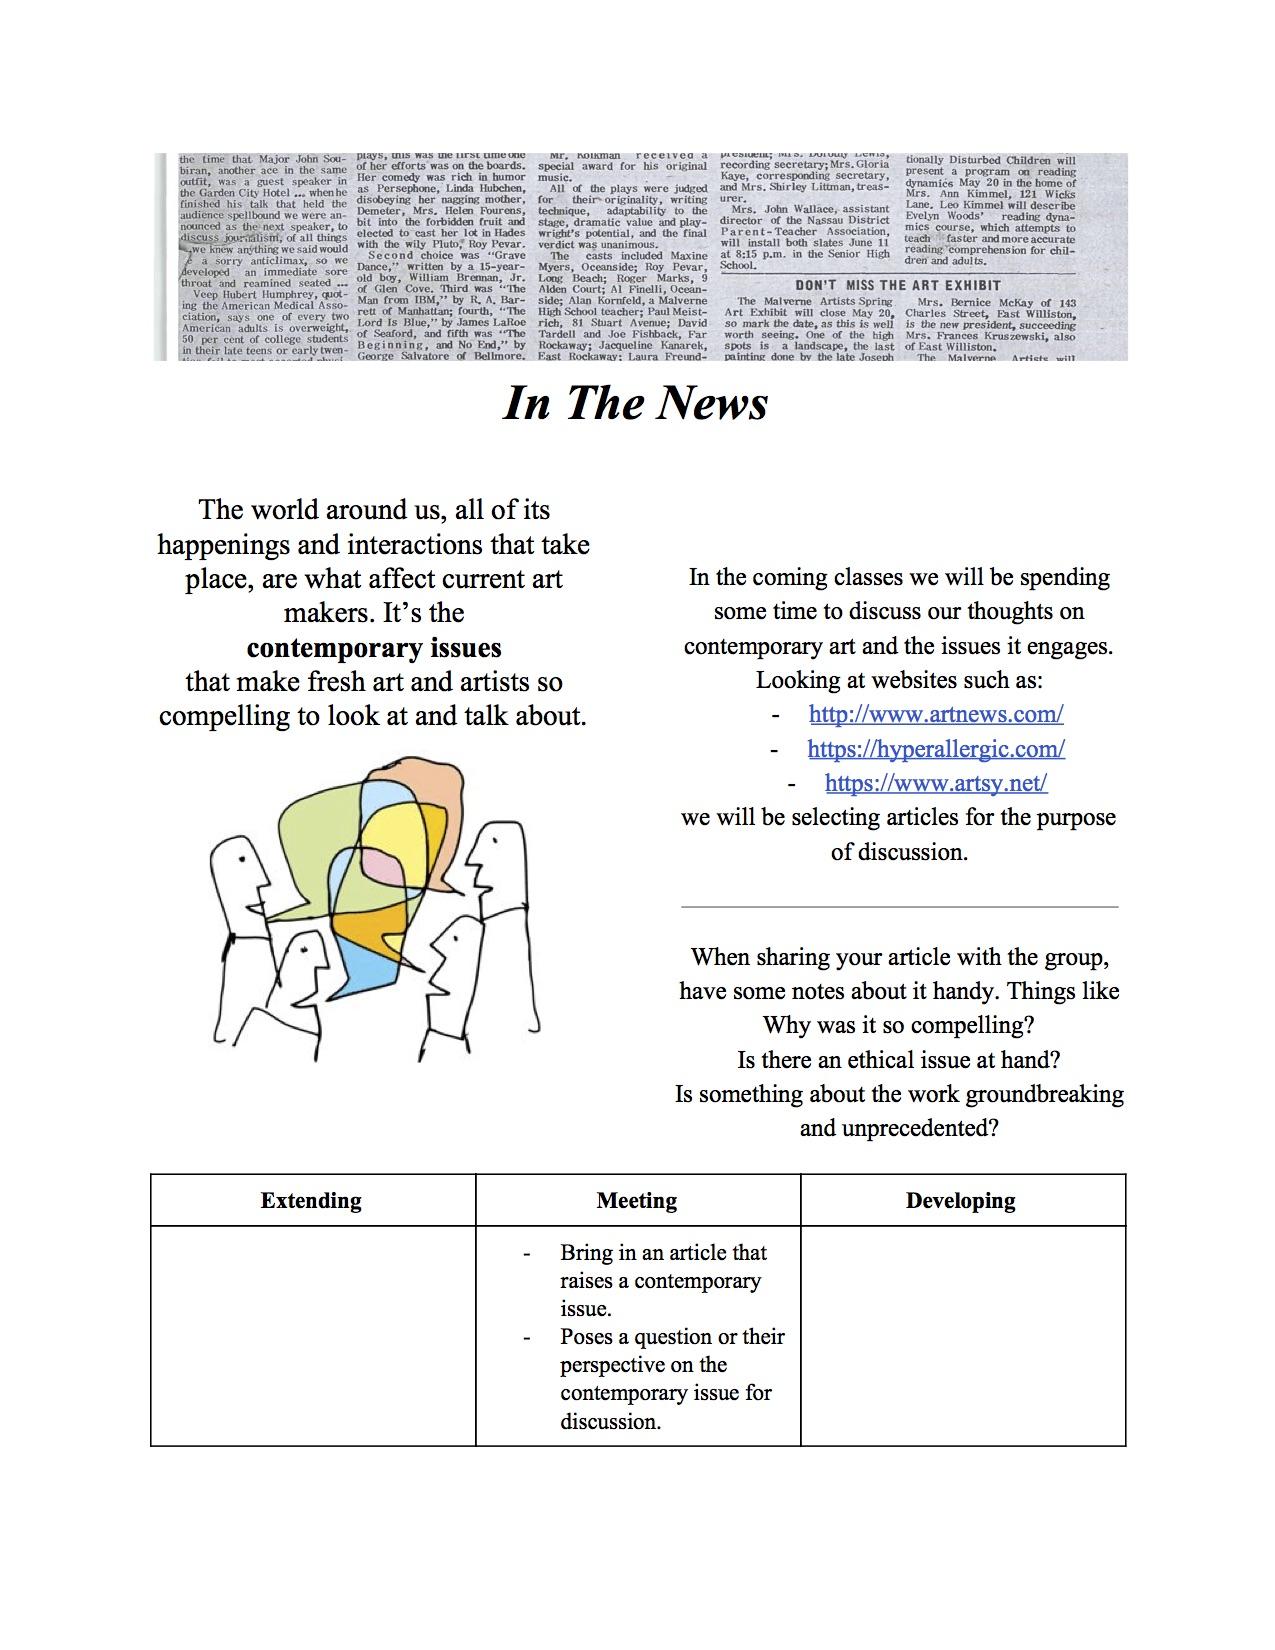 Contemporary Ideas Article Rubric (1).jpg